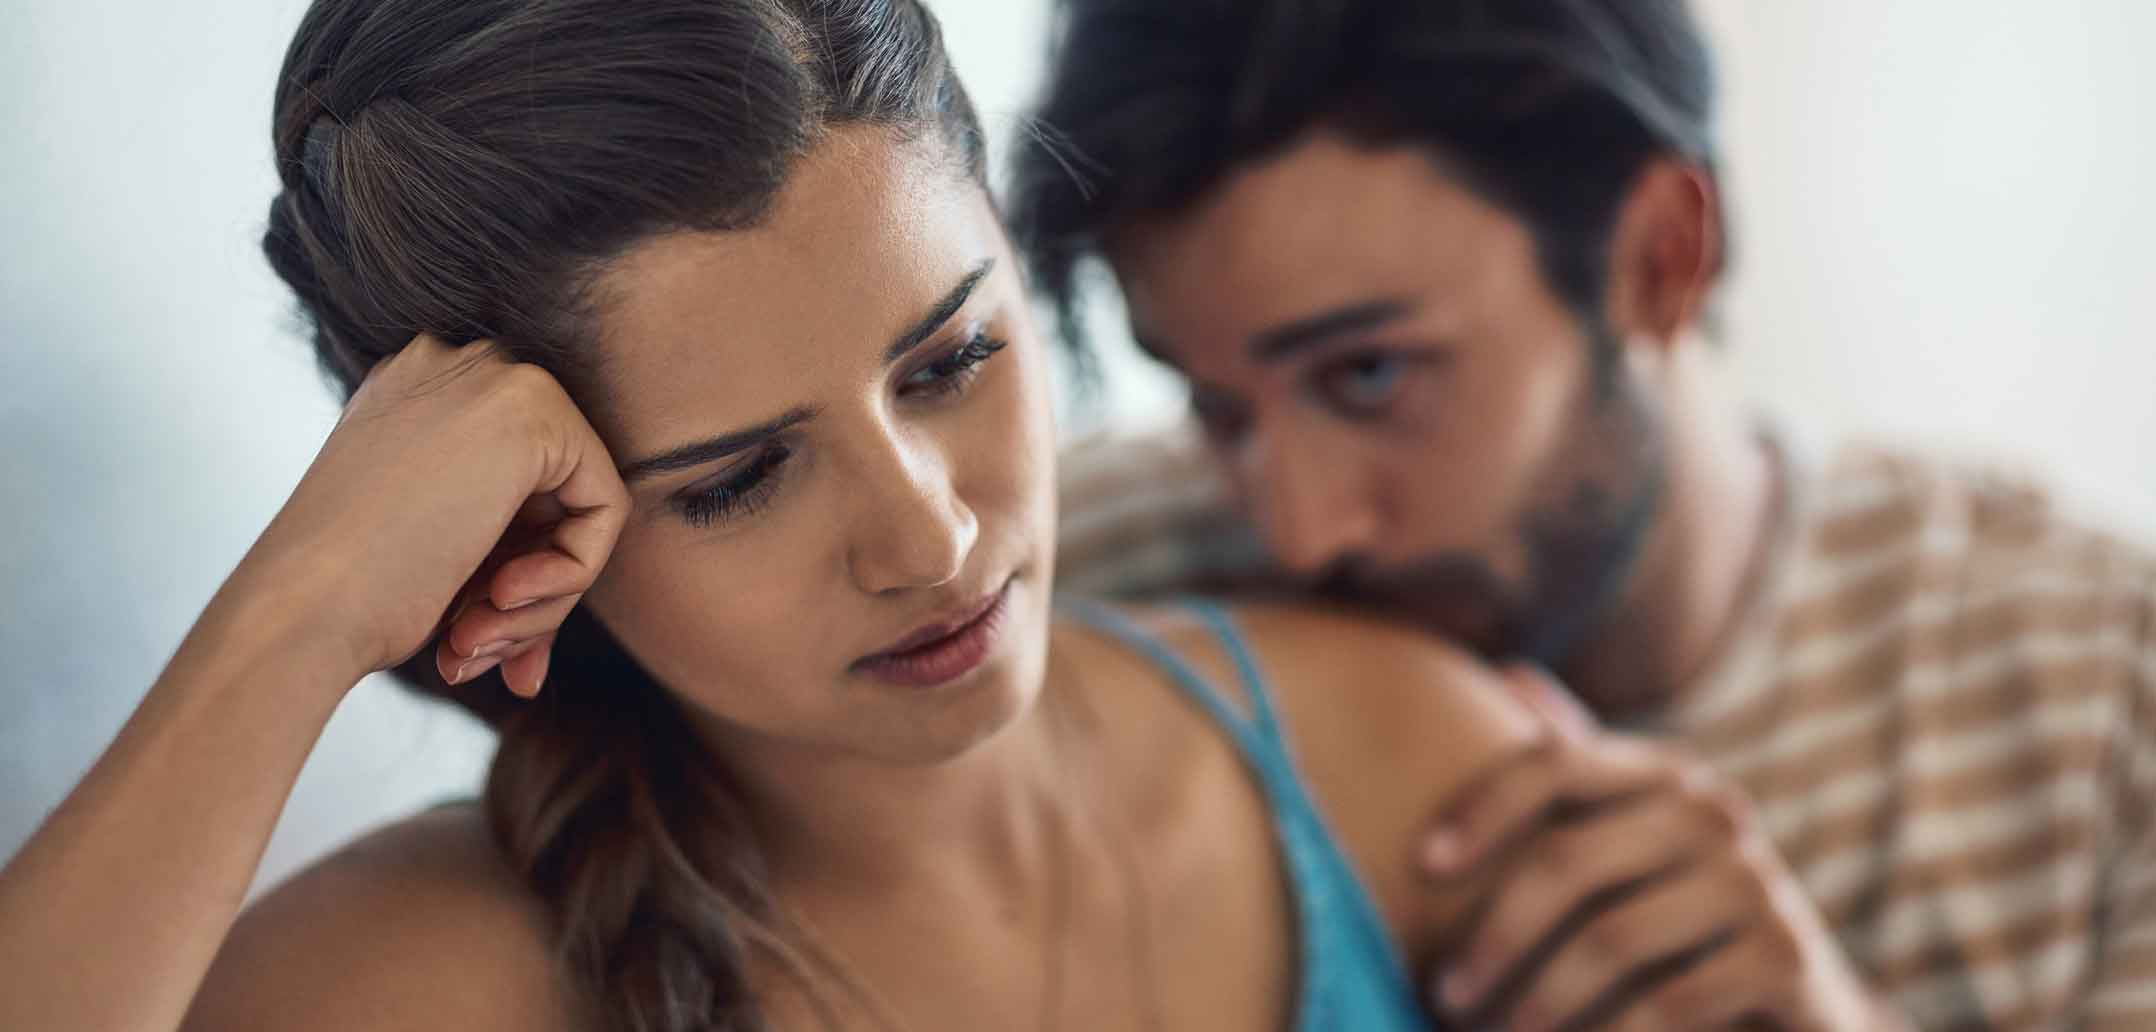 don't verheiratetes Sexforum love having really